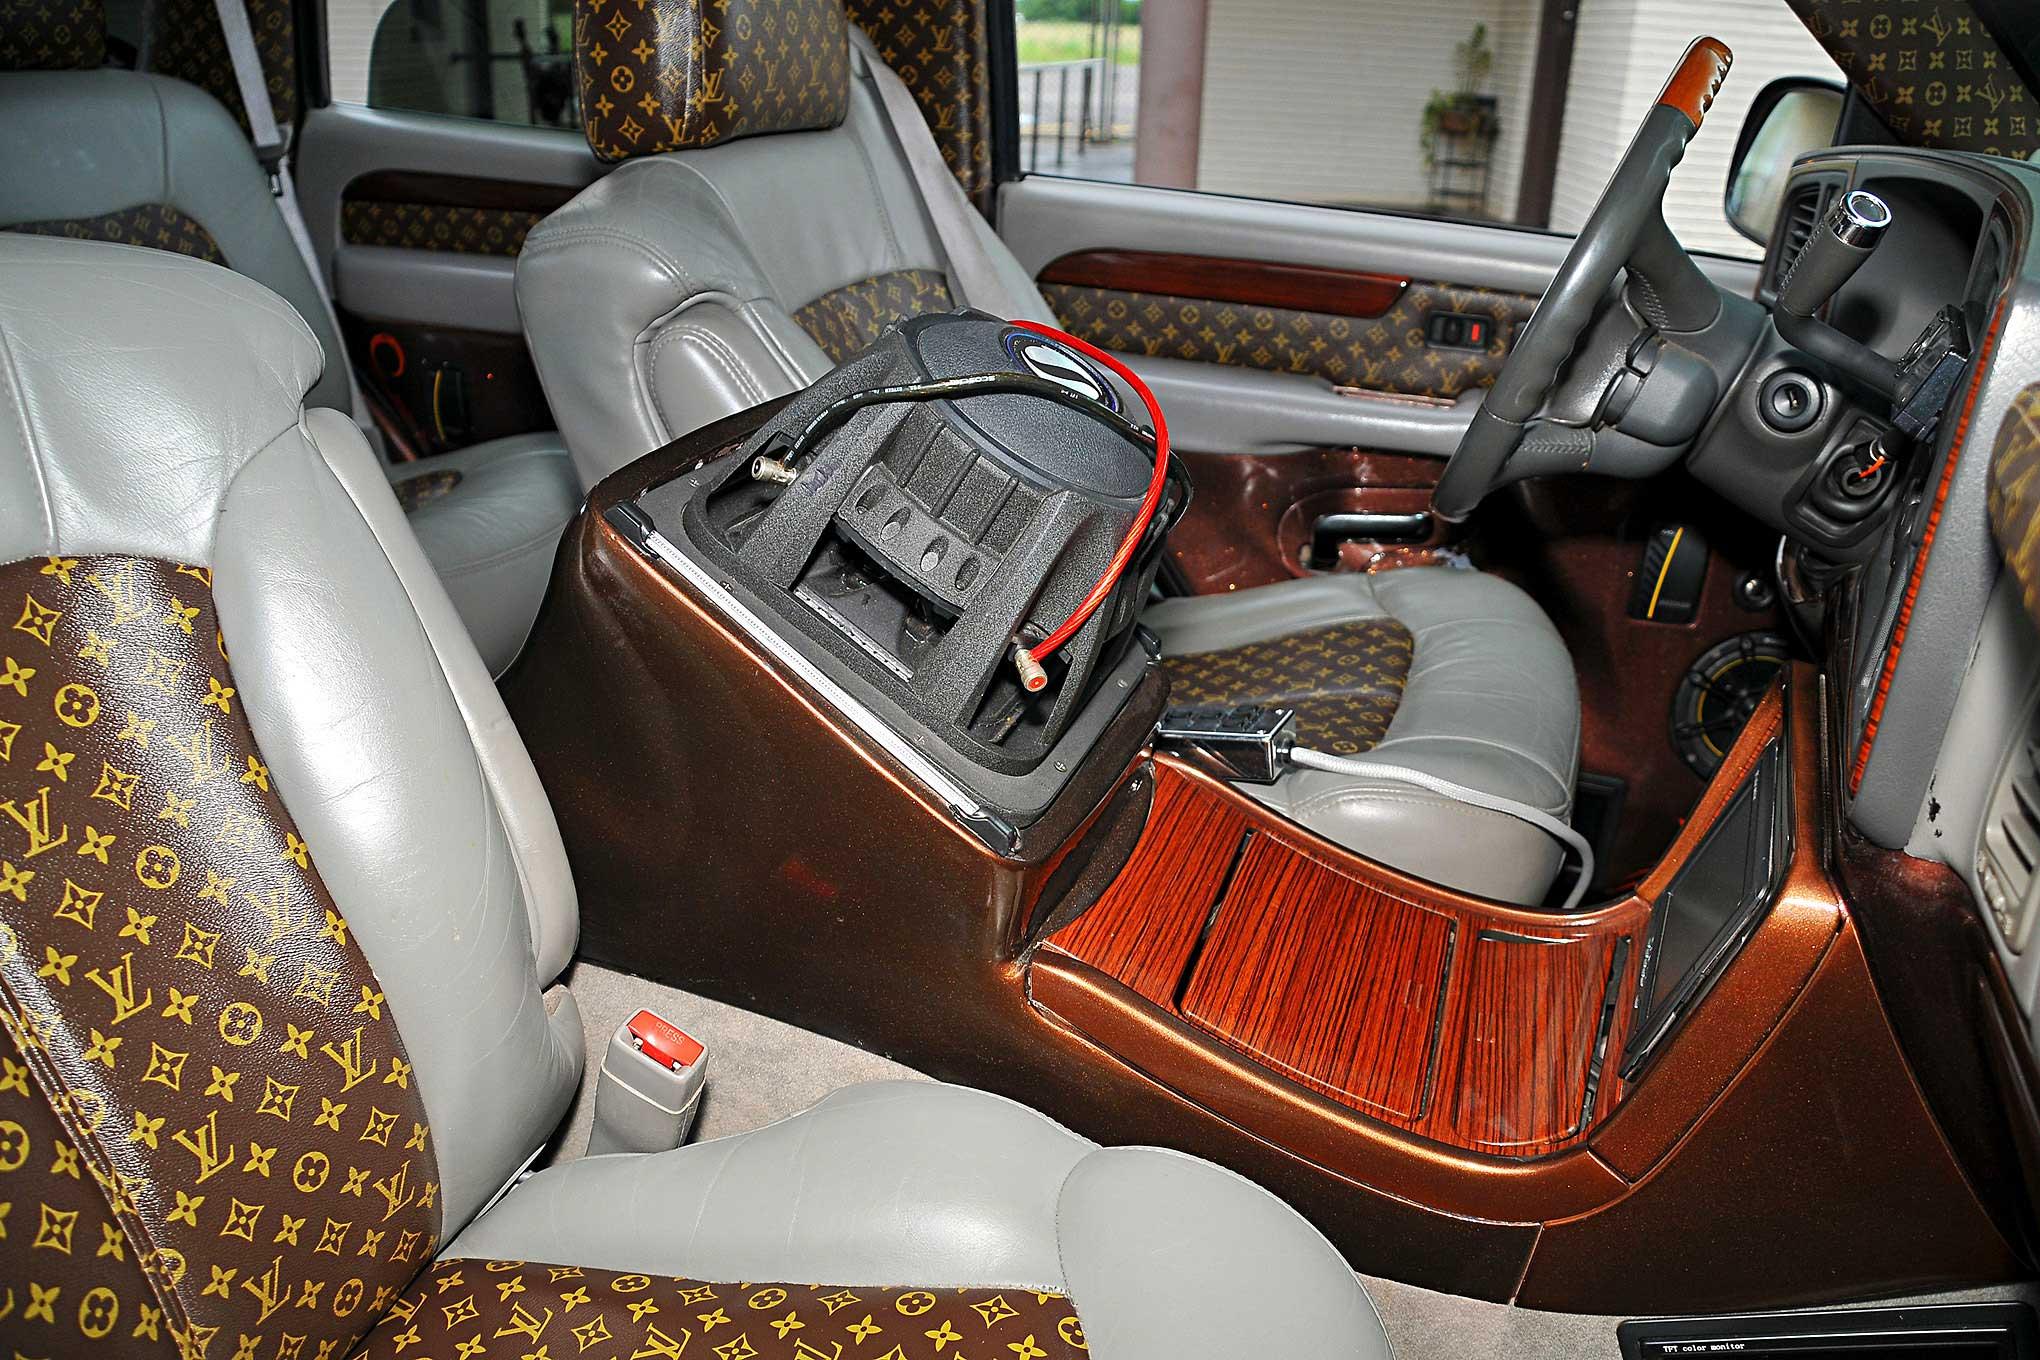 2002 Cadillac Escalade Custom Center Console Lowrider